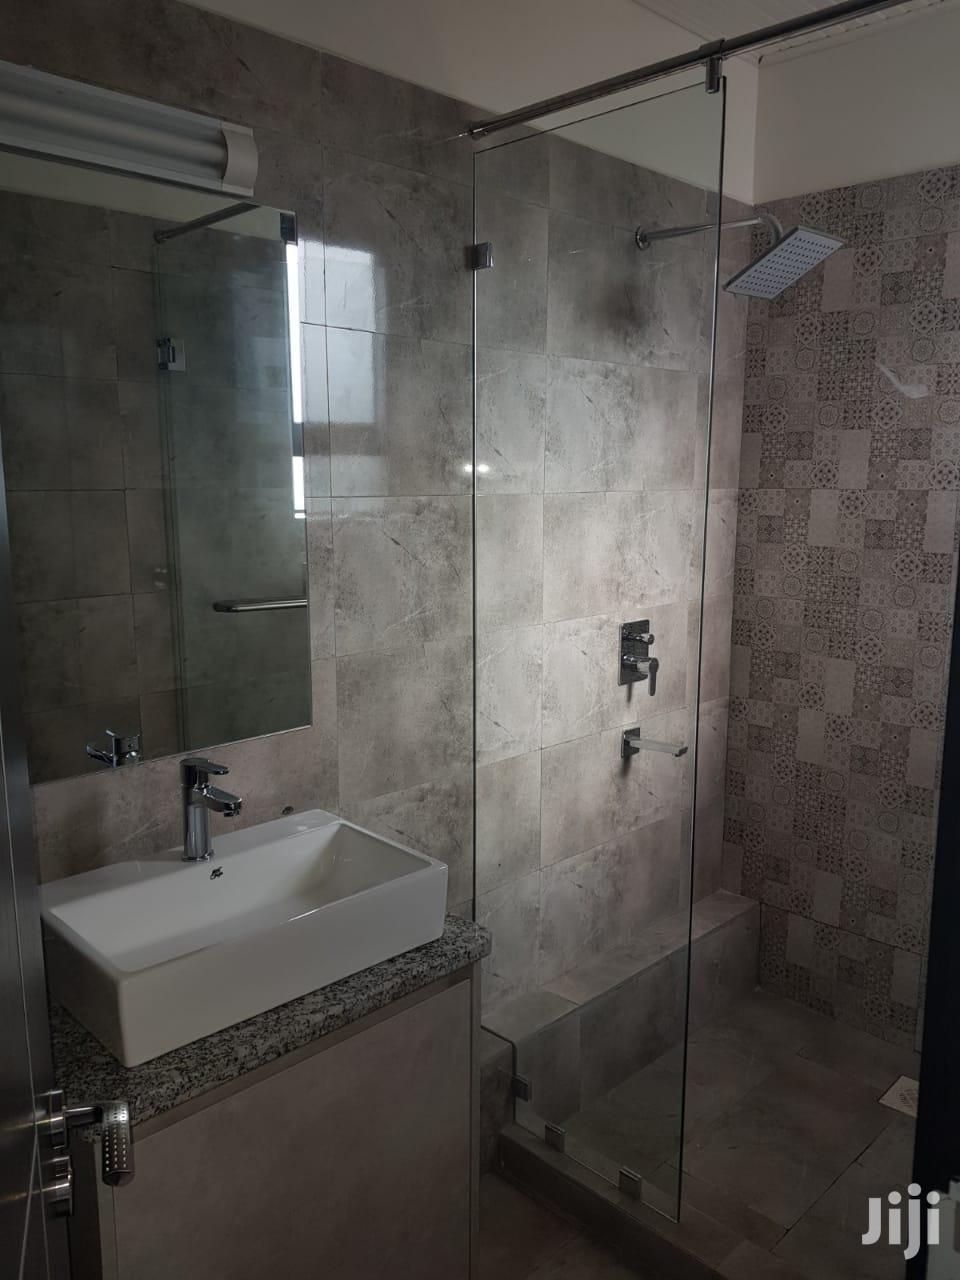 4 Bedroom Apartment + Dsq For Sale (All Ensuite) 25M Negotiable | Houses & Apartments For Sale for sale in Lavington, Nairobi, Kenya